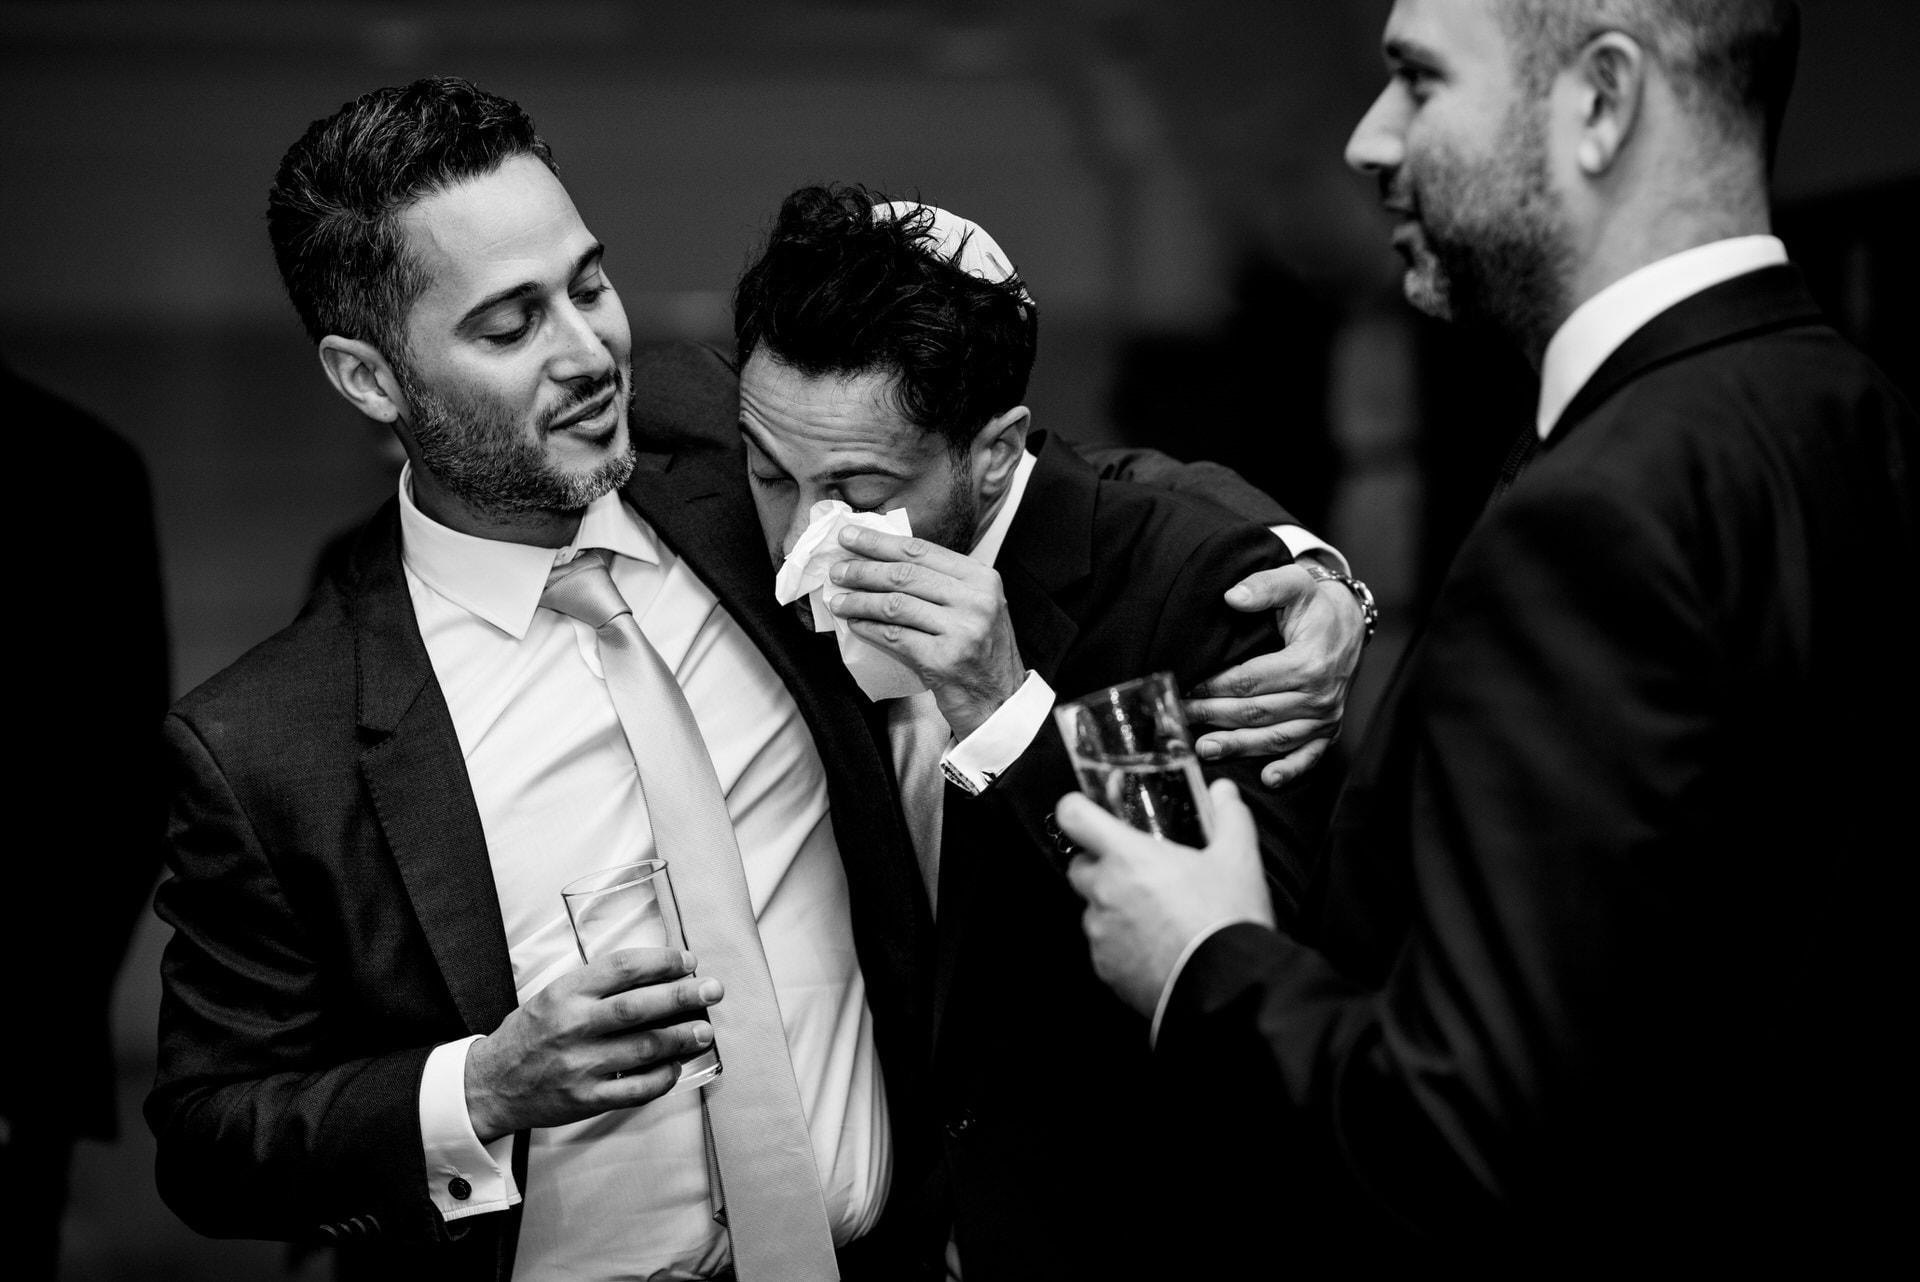 emotional groom at tisch